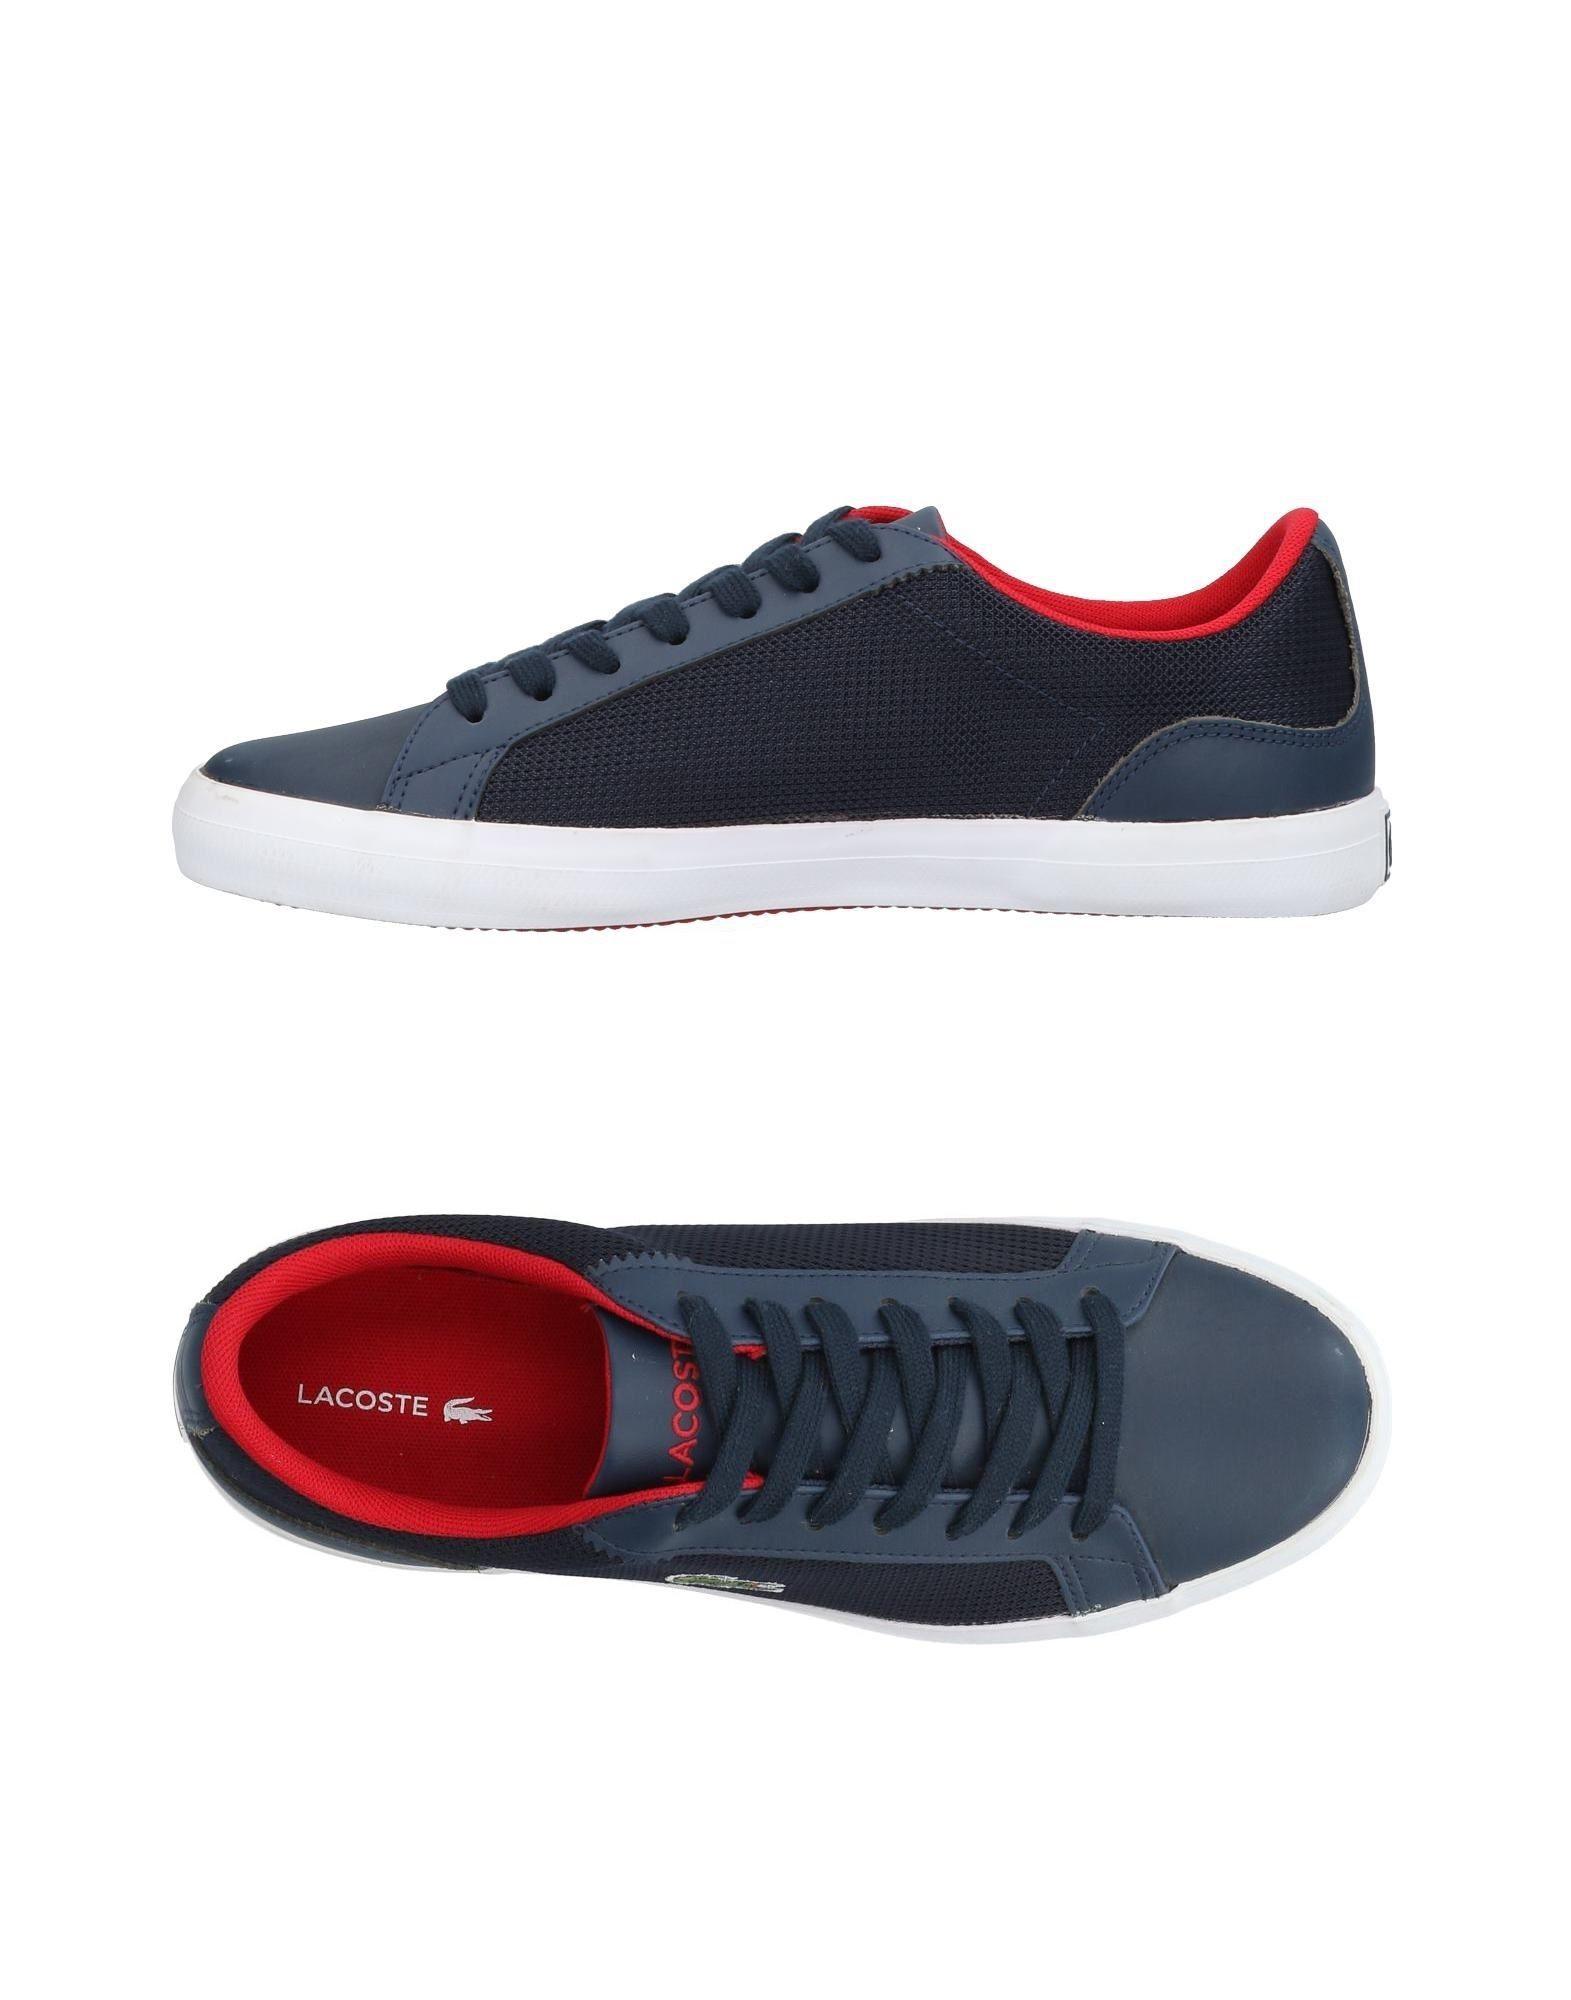 e72302b78f5 LACOSTE ΠΑΠΟΥΤΣΙΑ Παπούτσια τένις χαμηλά, Ανδρικά παπούτσια τέννις ...